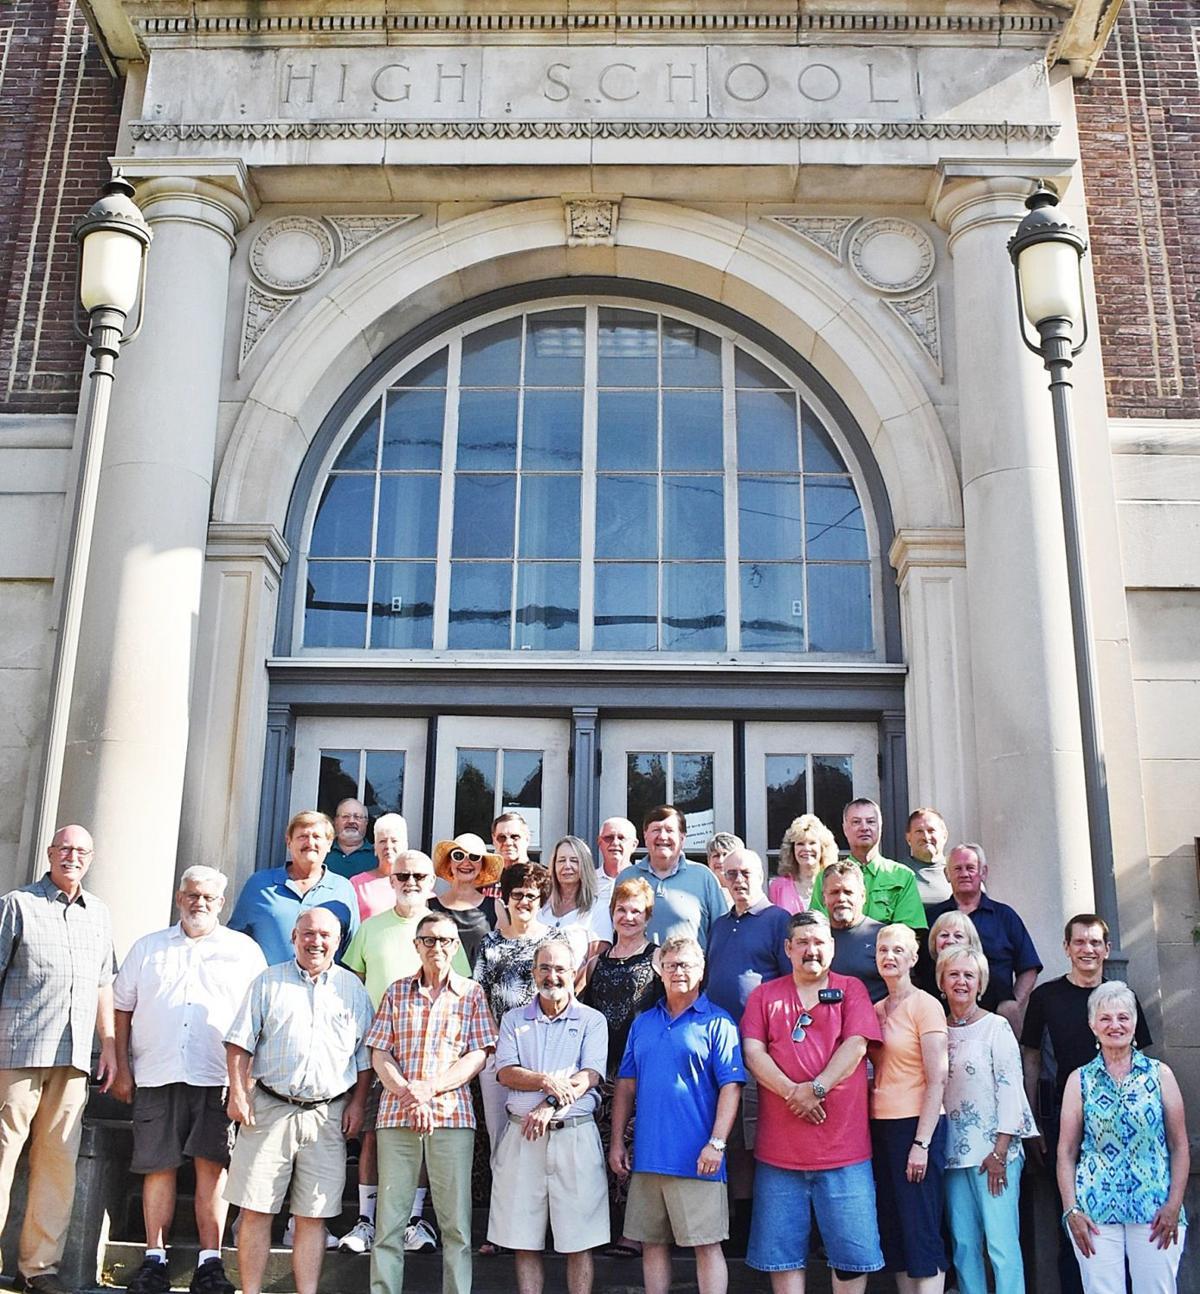 SAHS Class of '68 - 50th reunion photo outside